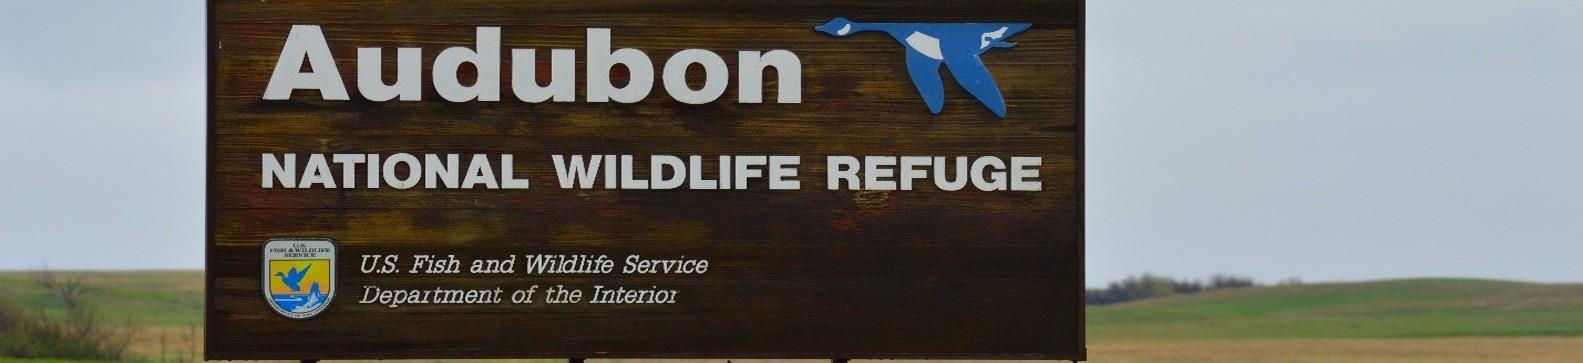 Audubon NWR Headquarters & Visitor Center